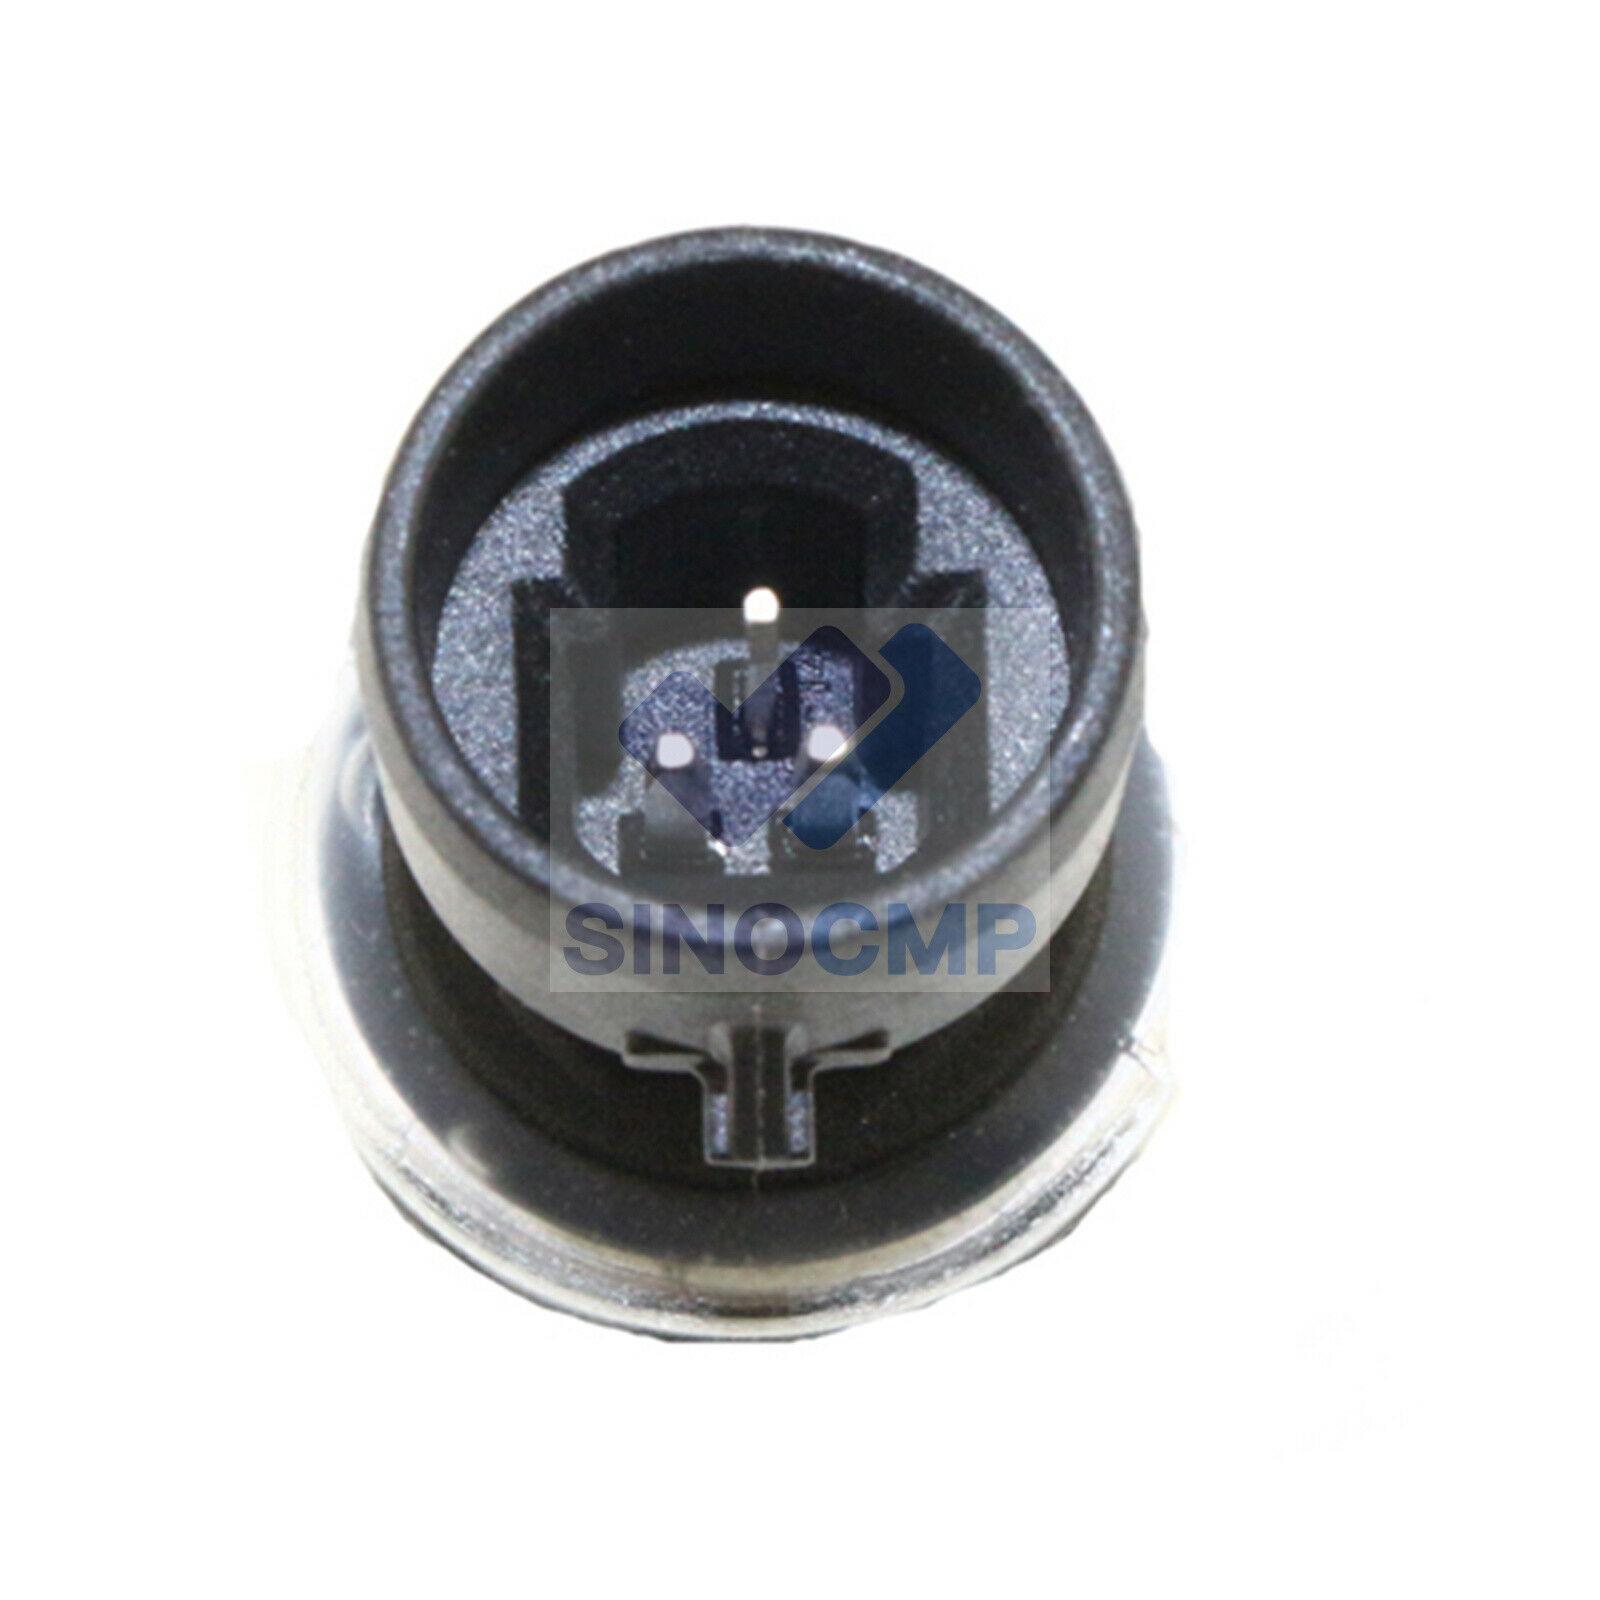 D1846A 12616646 Oil Pressure Sensor Switch For Buick Chevy Chevrolet Trailblazer